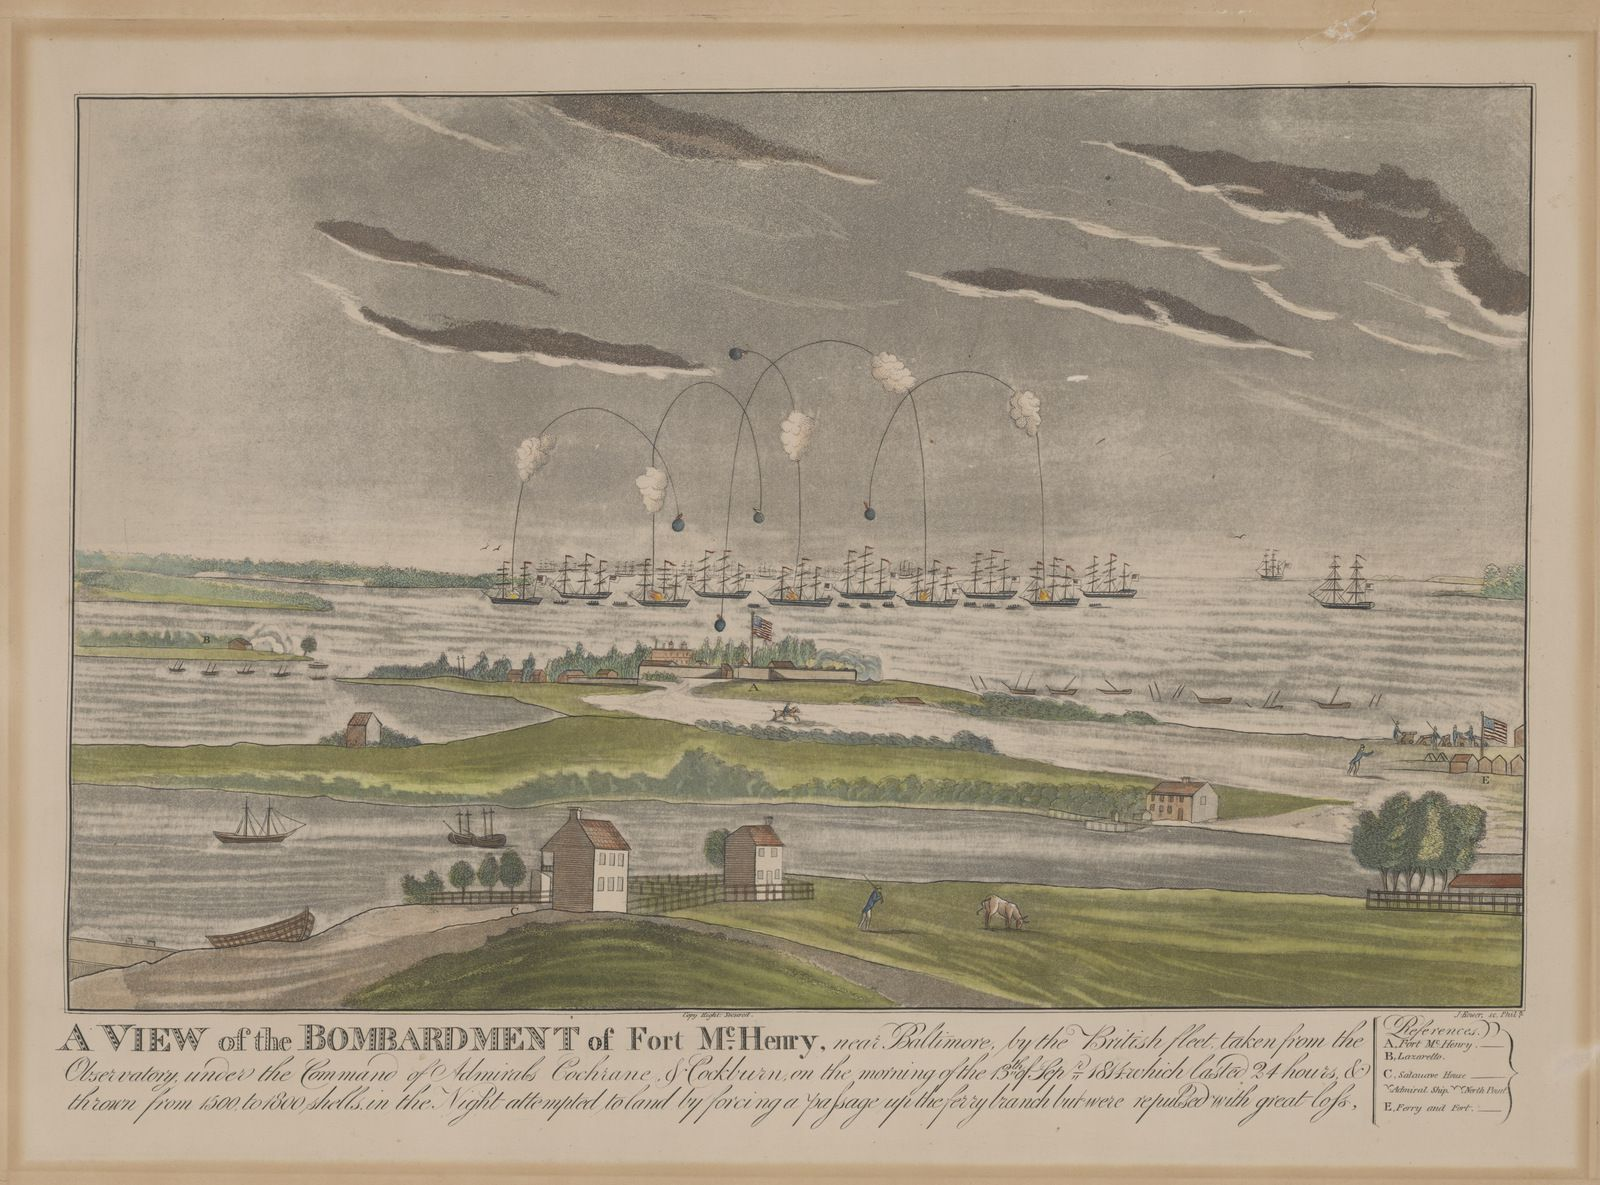 Fusée Congreve - Congreve rocket - Rochettes - Bombardement Fort McHenry - Baltimore - 1814 - Hymne américain - The Star-Spangled Banner - Francis Scott Key - John Bower